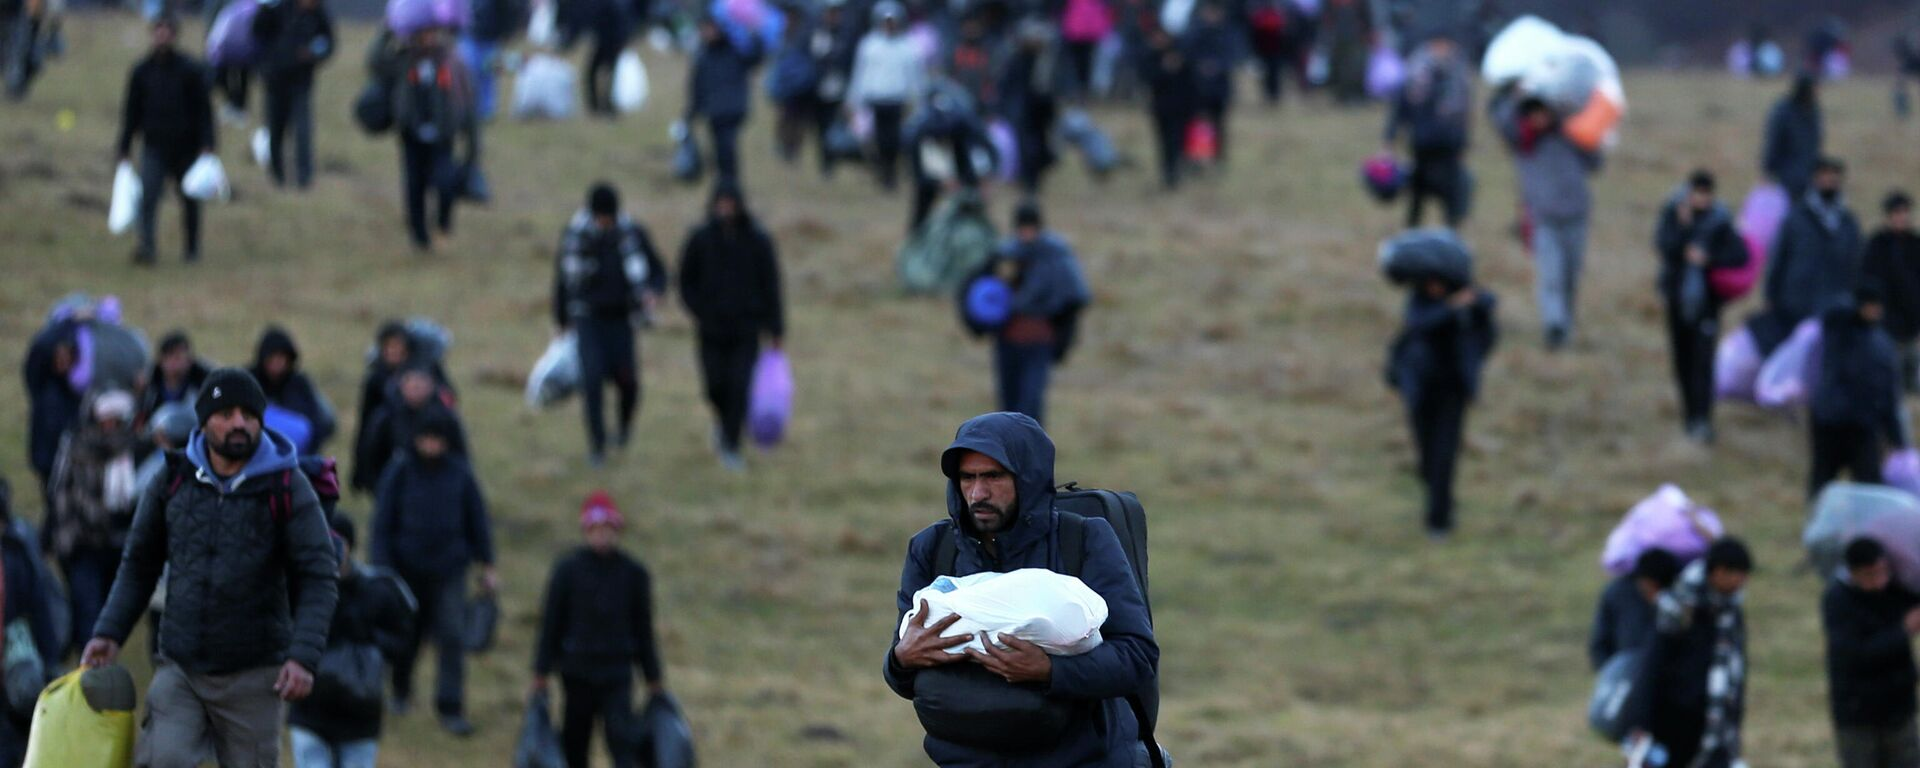 Migranten verlassen massenweise das Lager Lipa in Bosnien - SNA, 1920, 10.01.2021